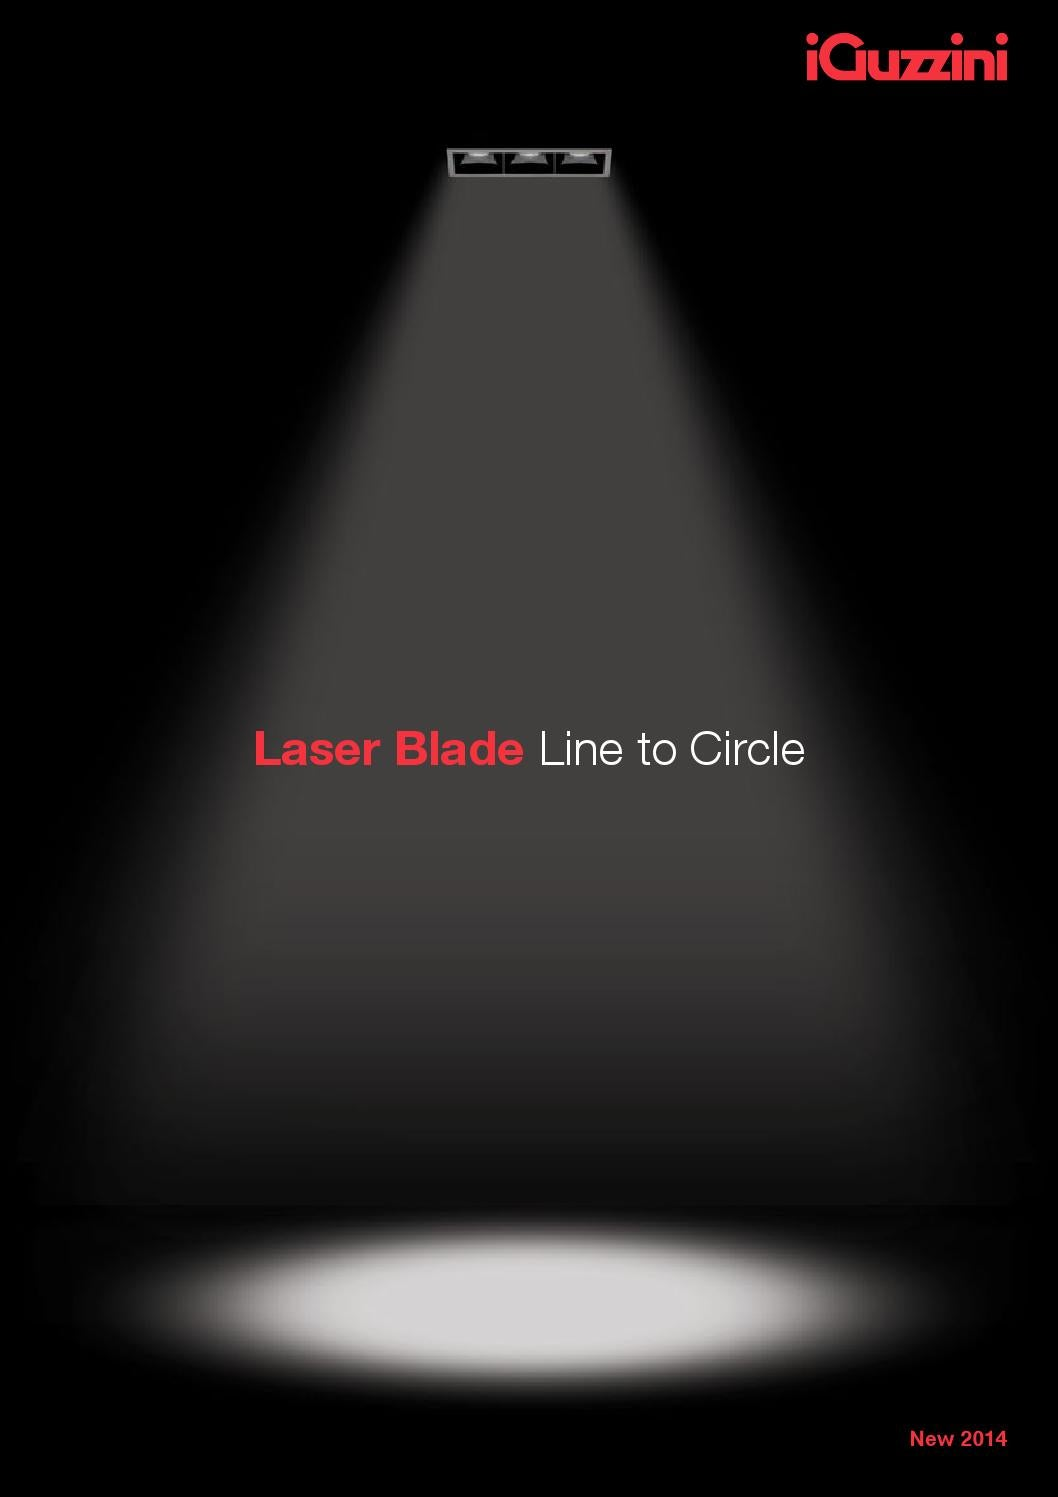 Laser Blade | Line to Circle. 2014 EN by iGuzzini illuminazione - issuu